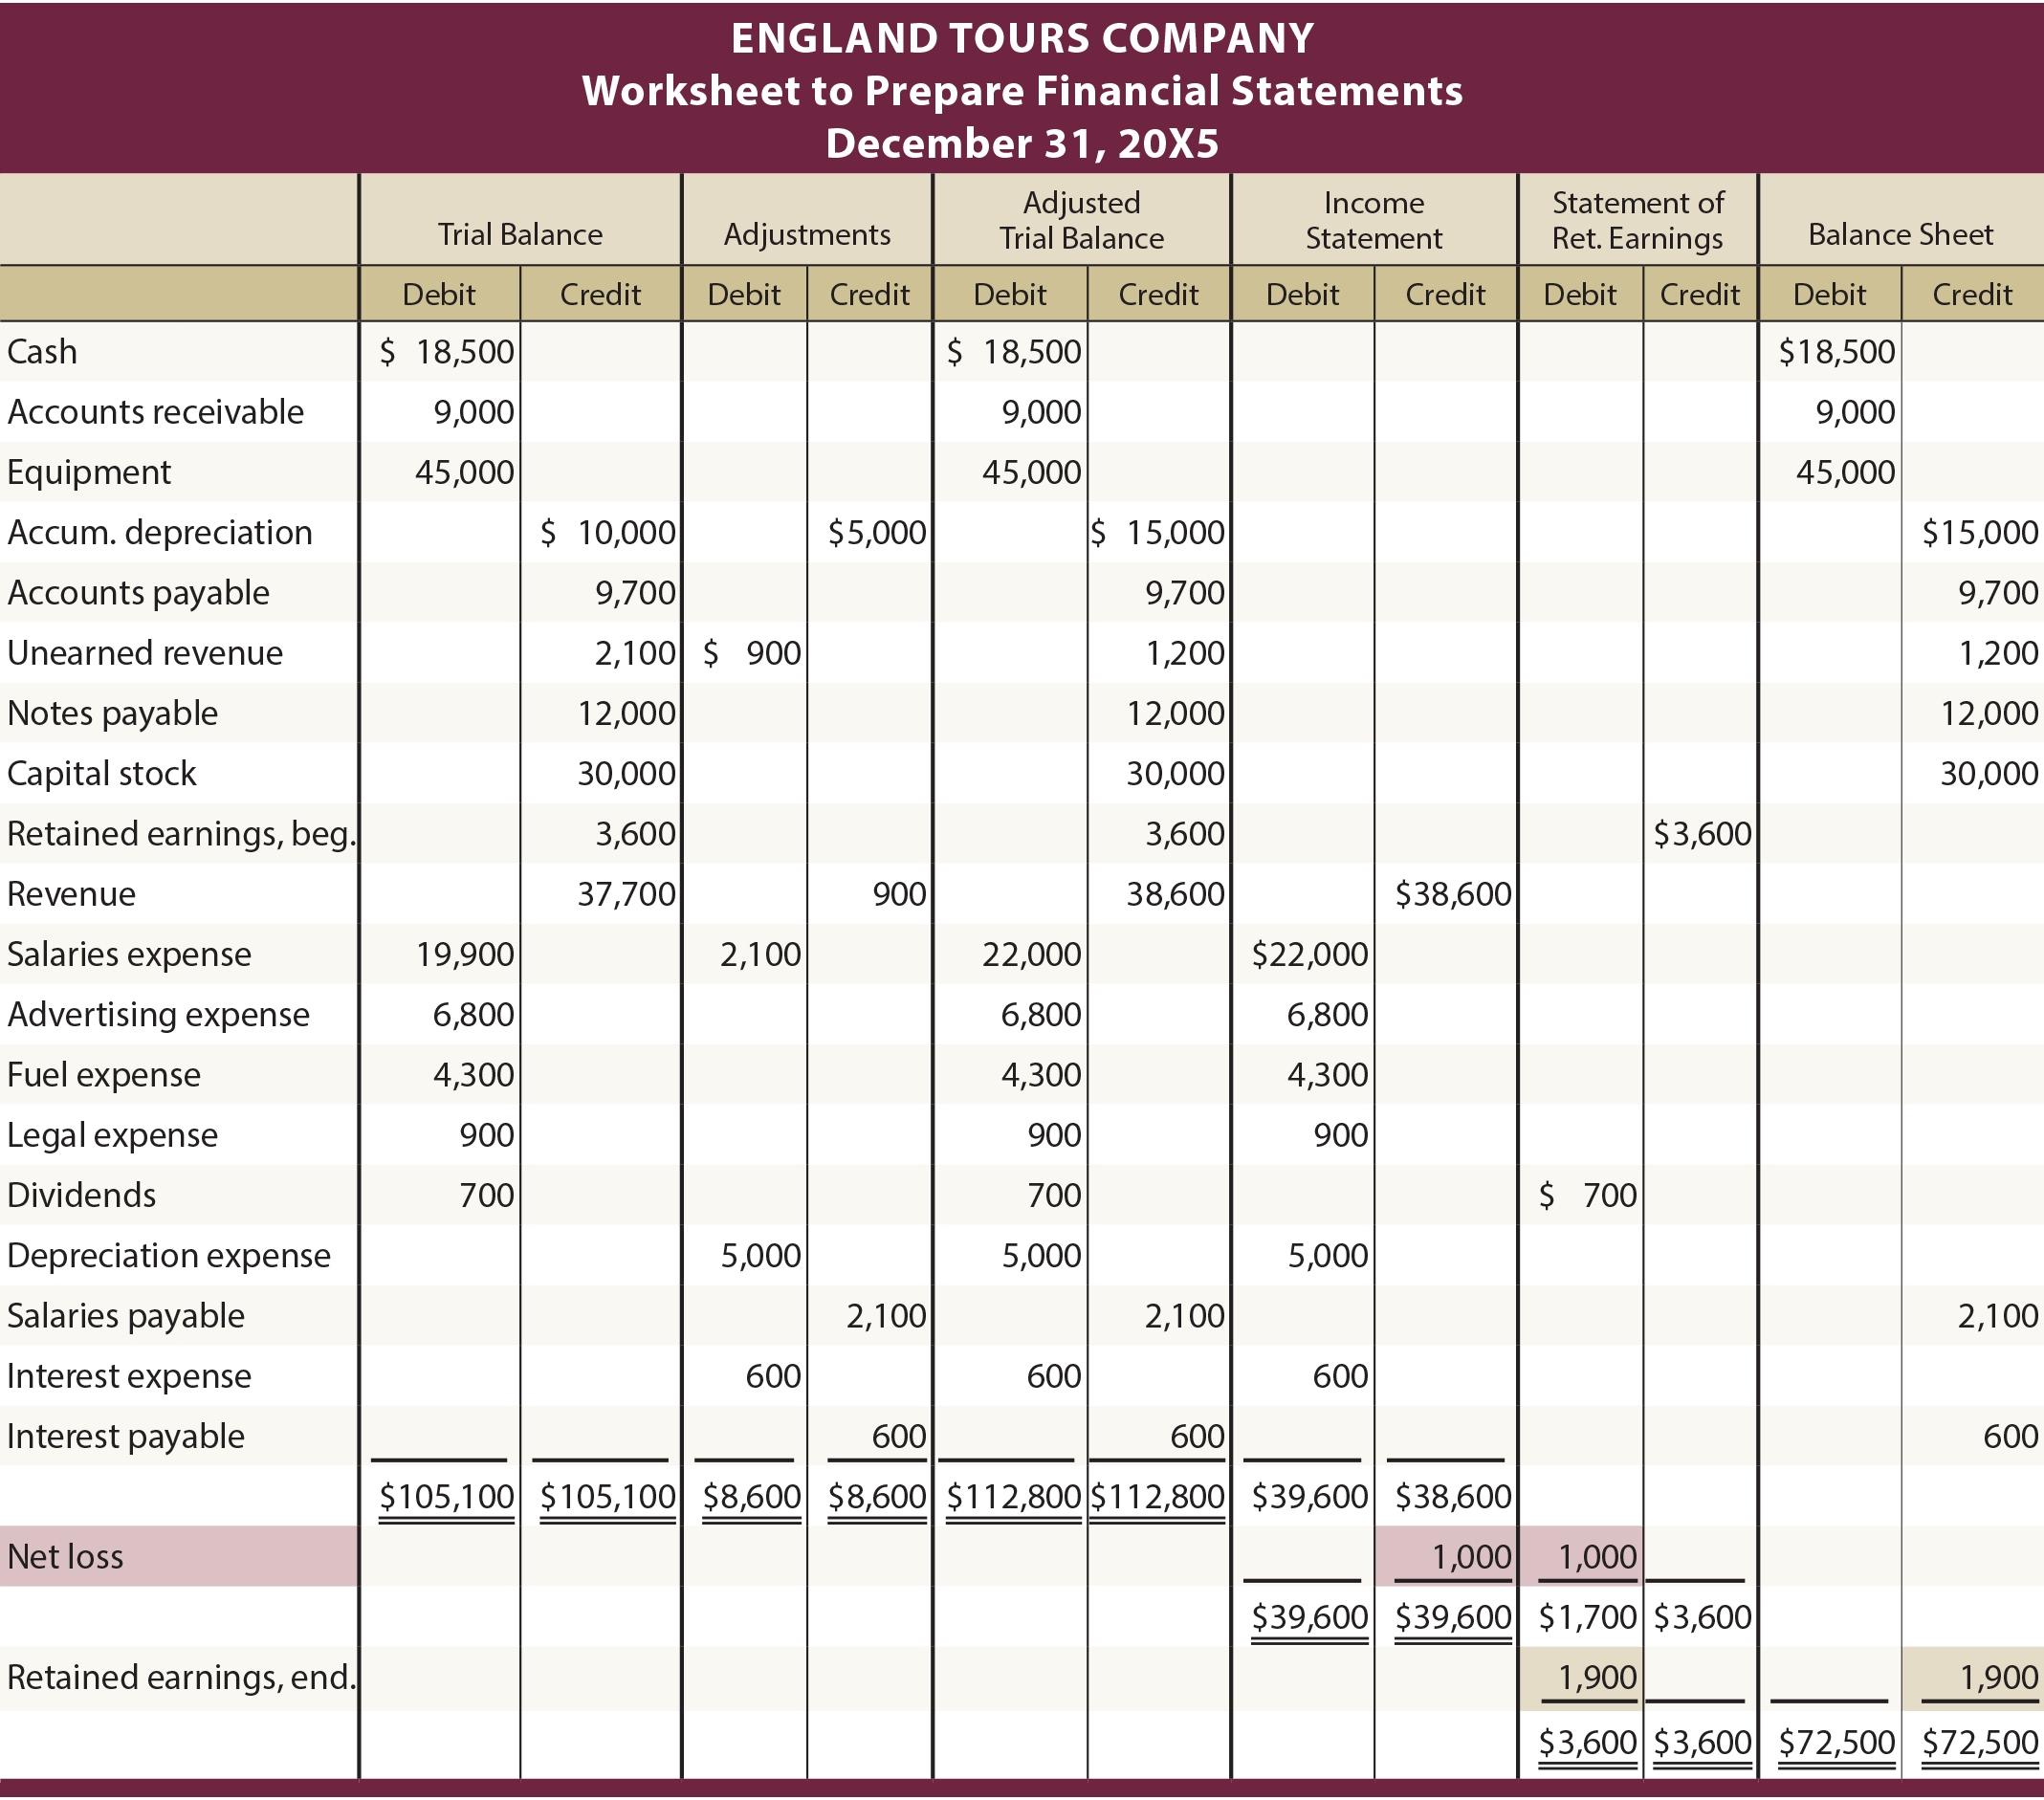 Income Statement Worksheet Worksheet 3 Absolute But England Tours In Income Statement Worksheet